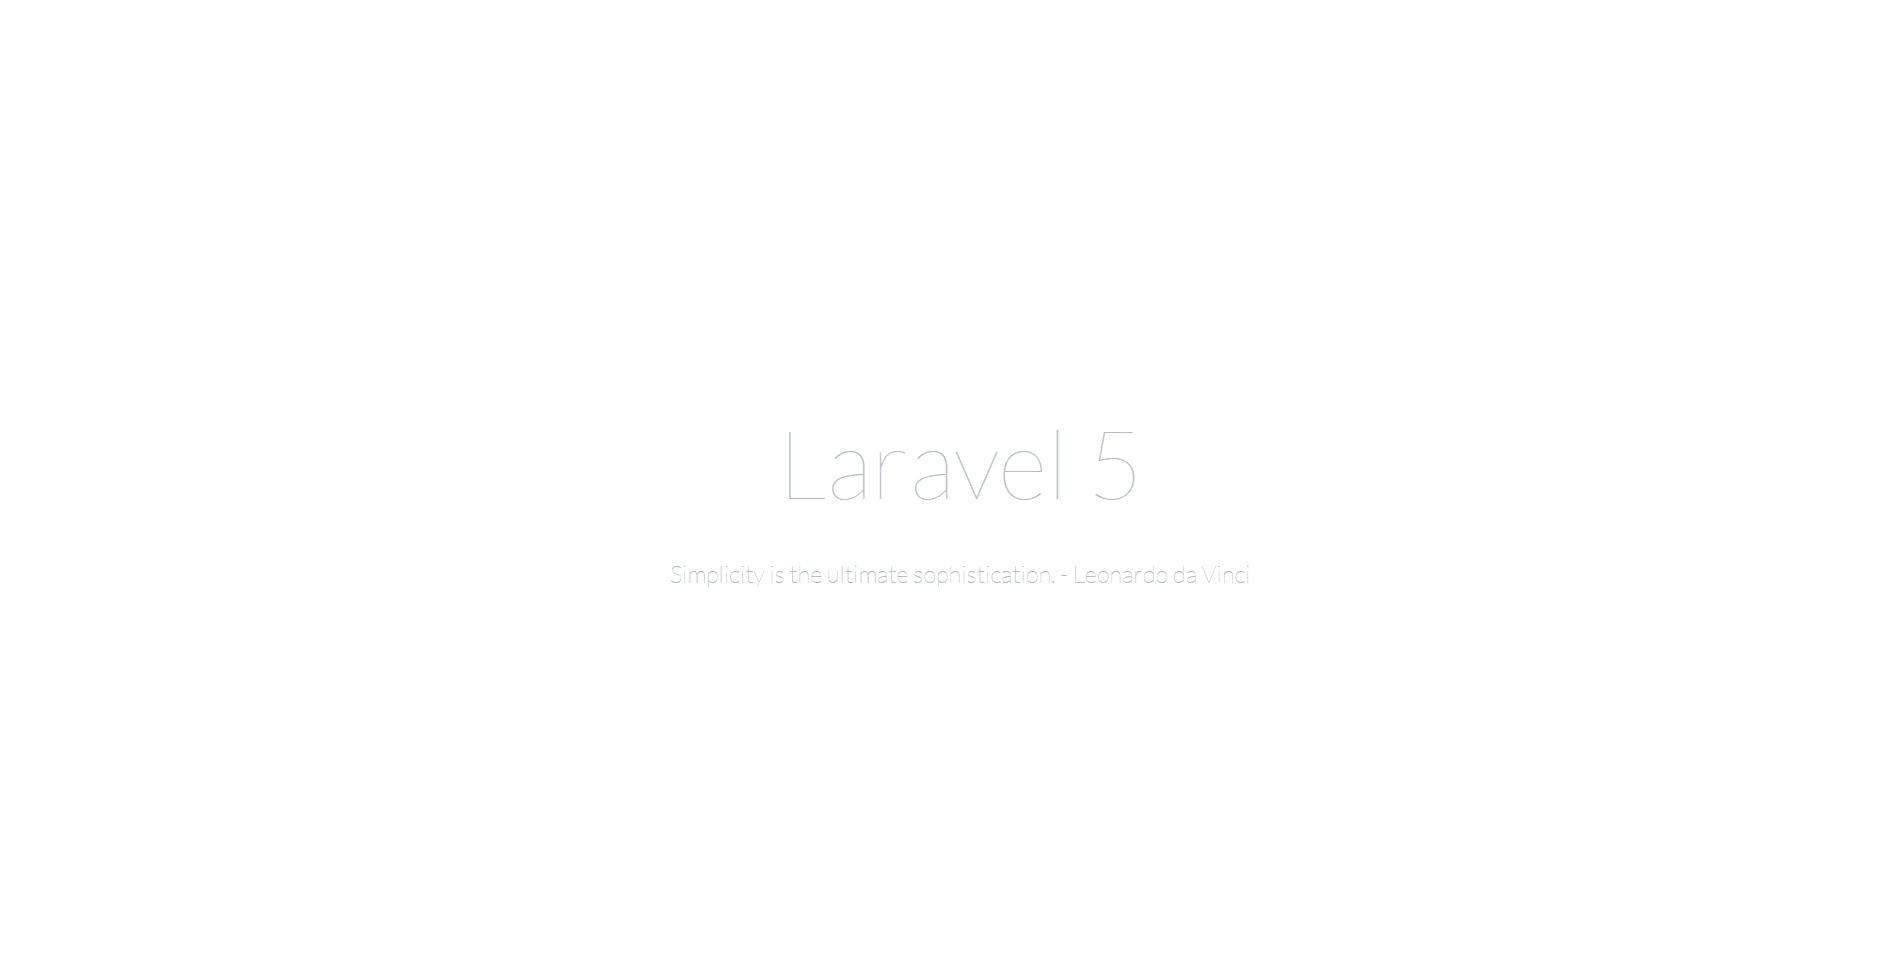 laravel.png